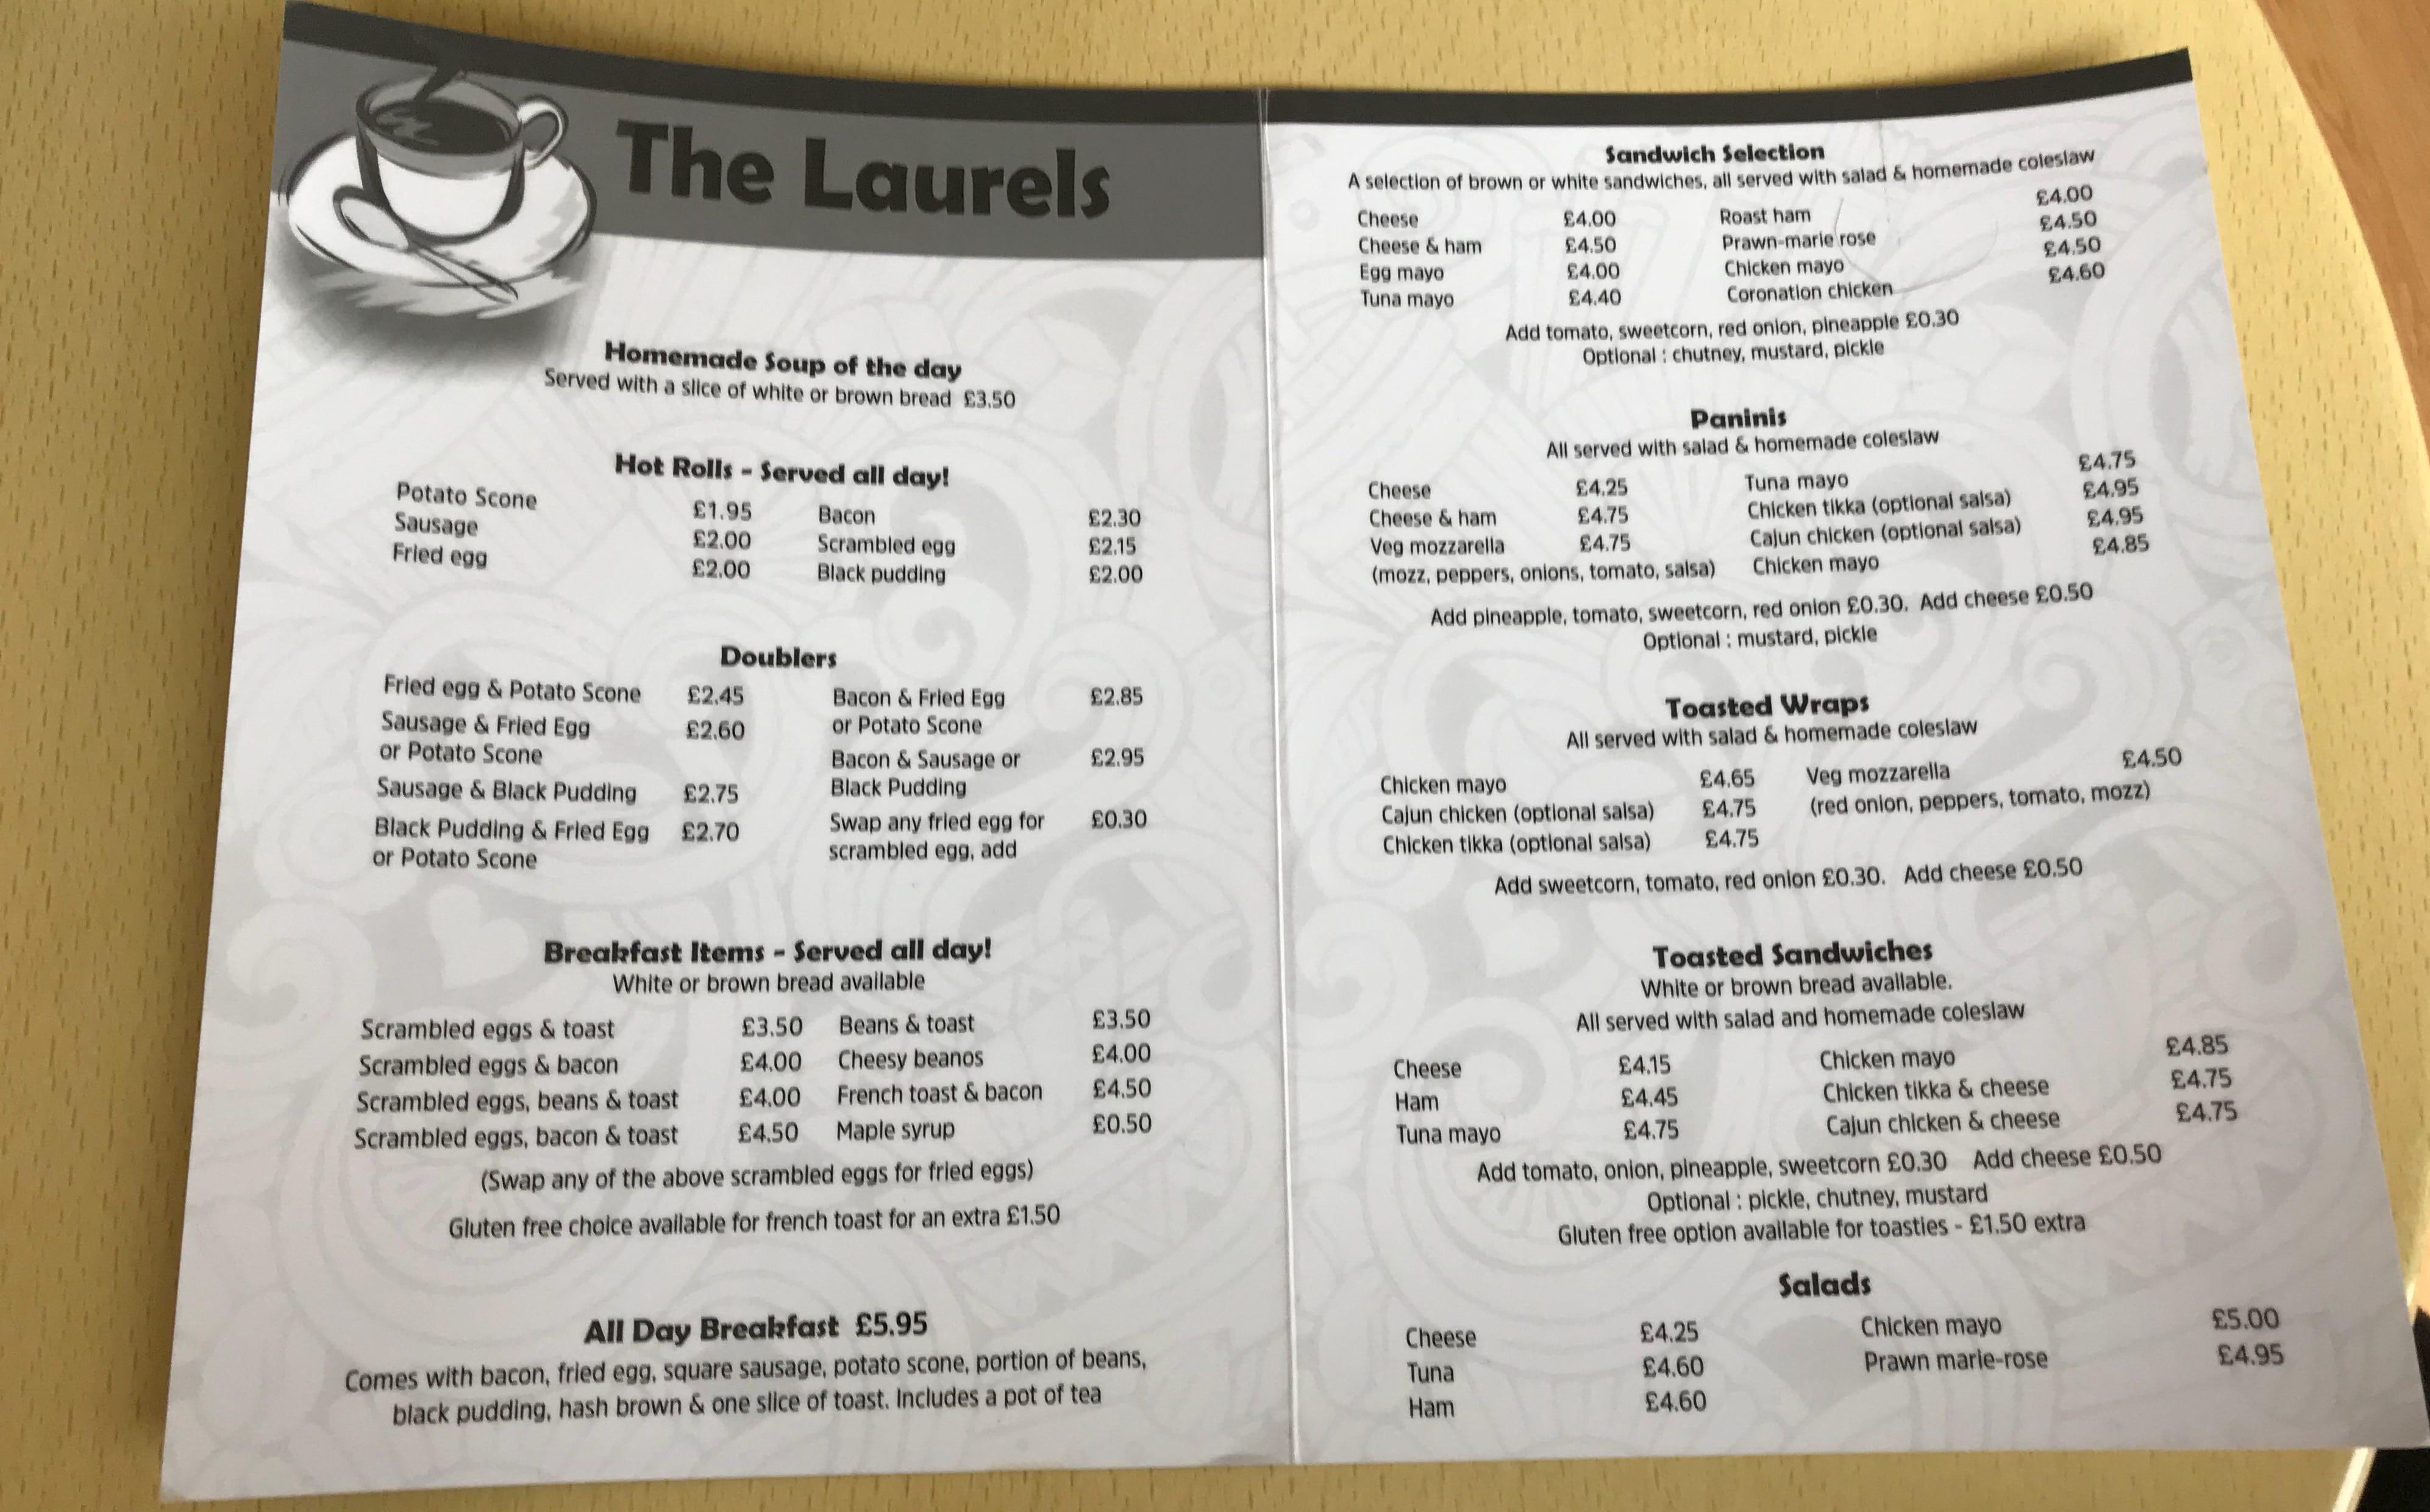 The laurels cafe muirend Glasgow